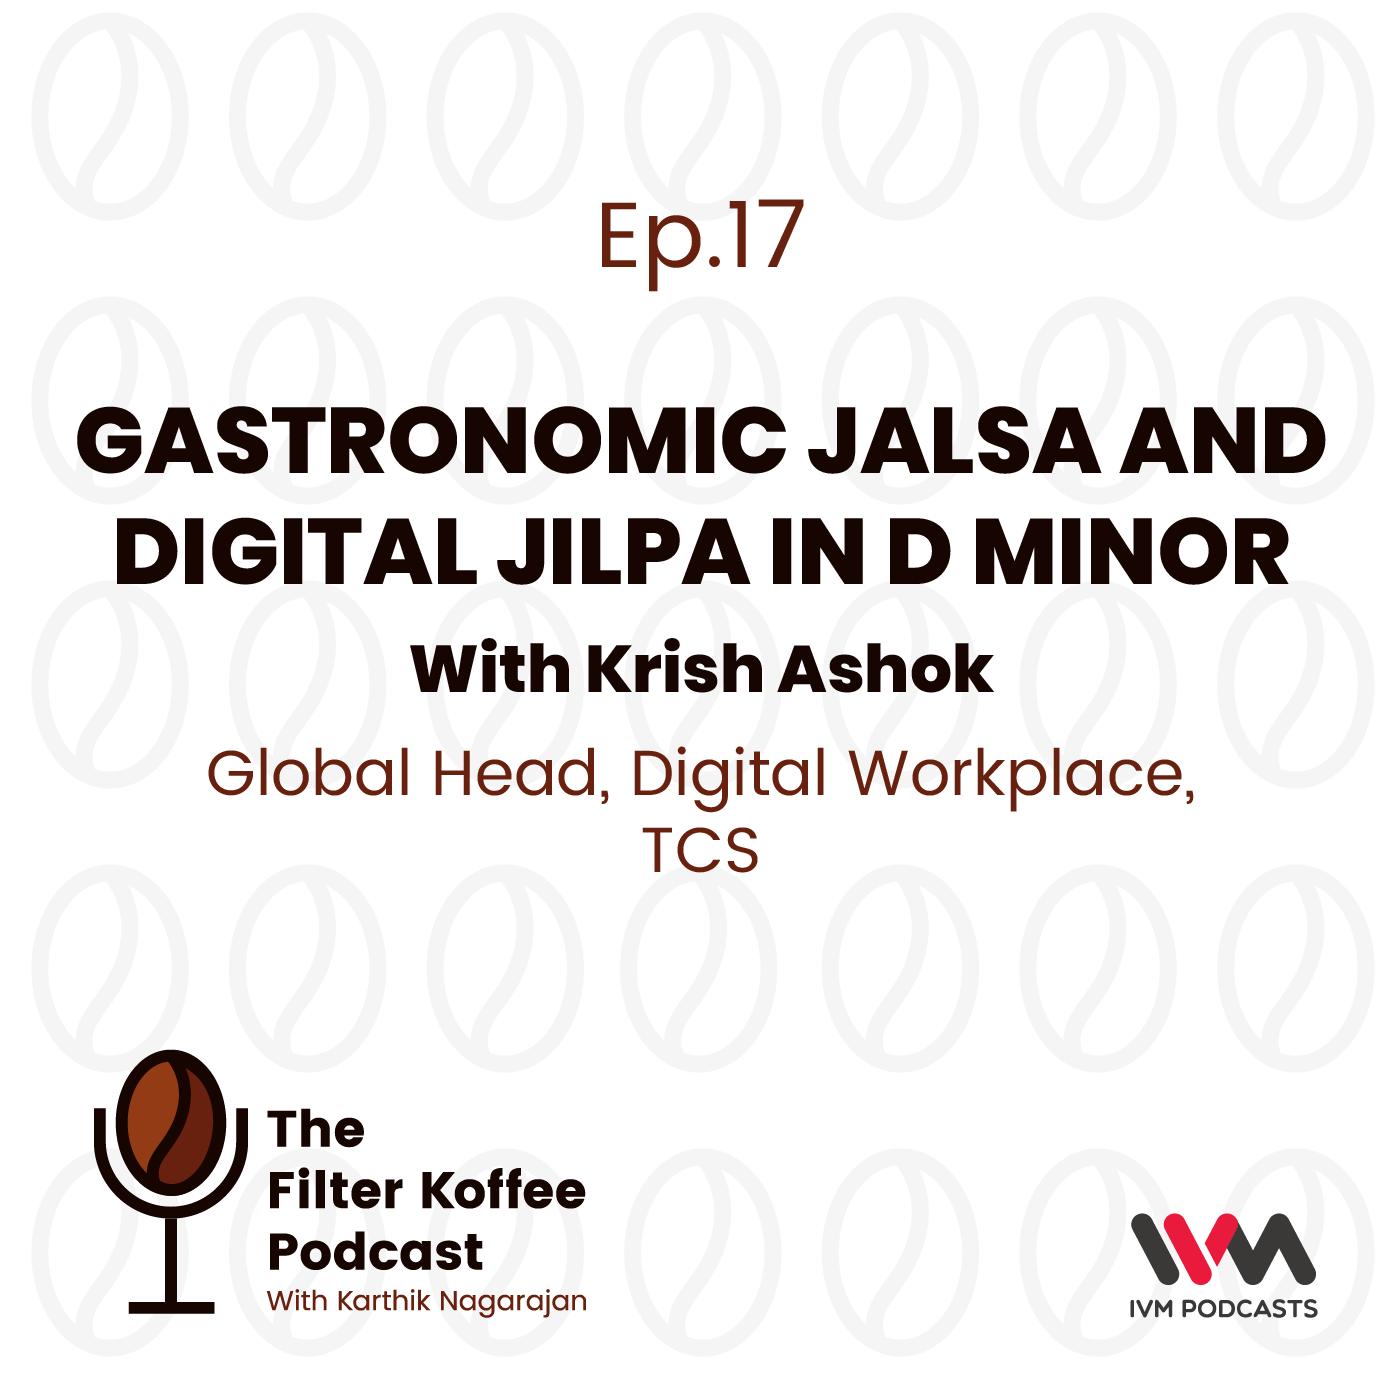 Ep. 17: Gastronomic Jalsa and Digital Jilpa in D Minor with Krish Ashok